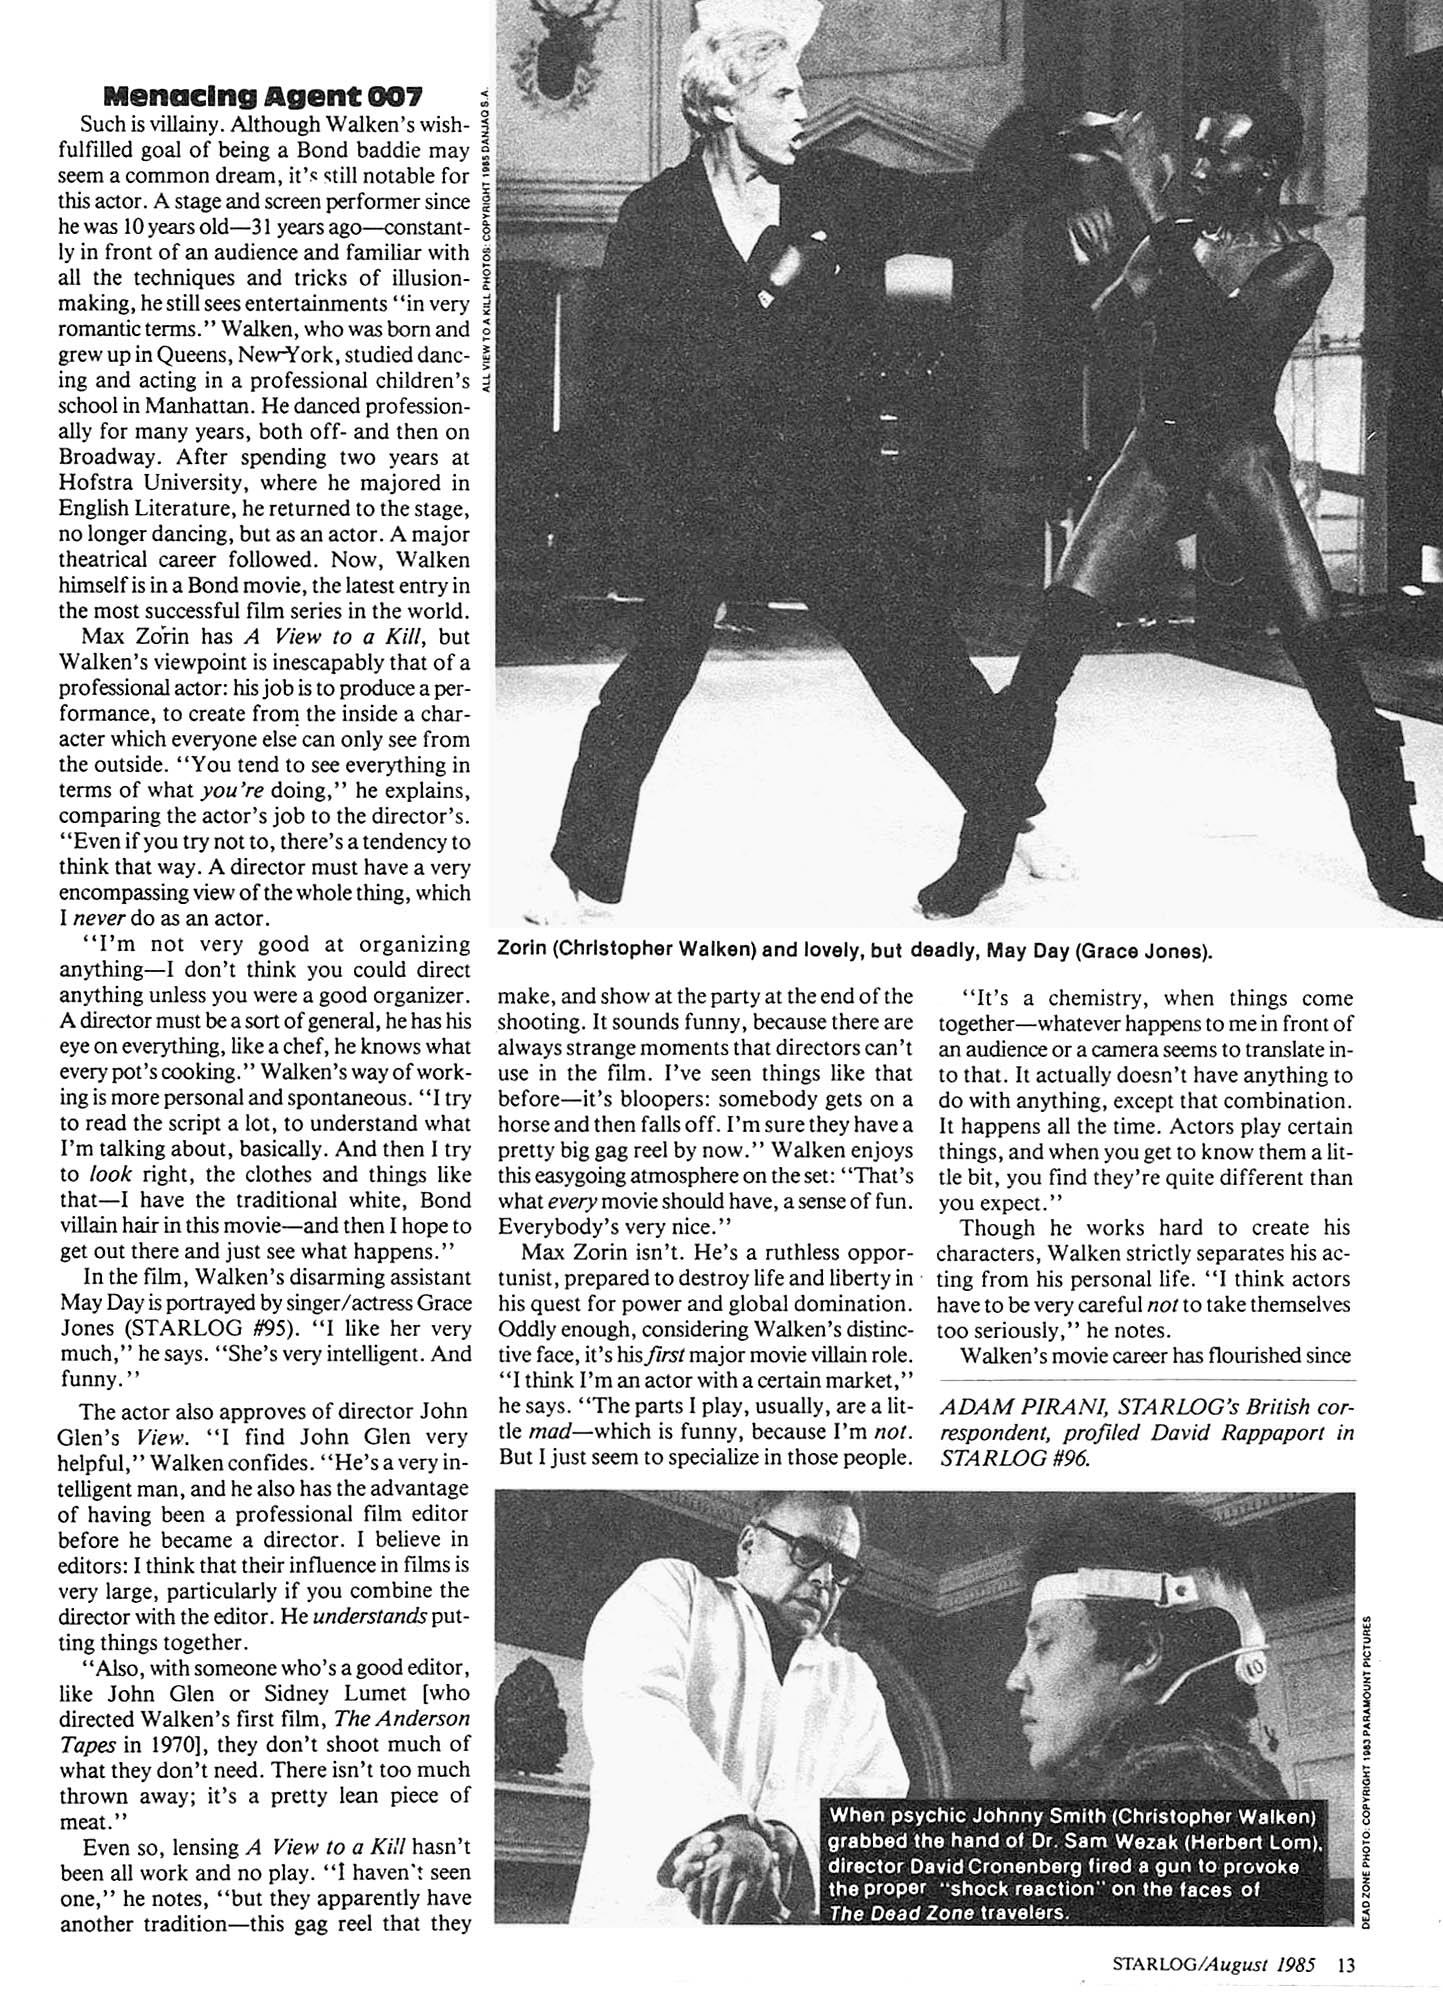 Starlog 097 1985 08 Bond-2.jpg